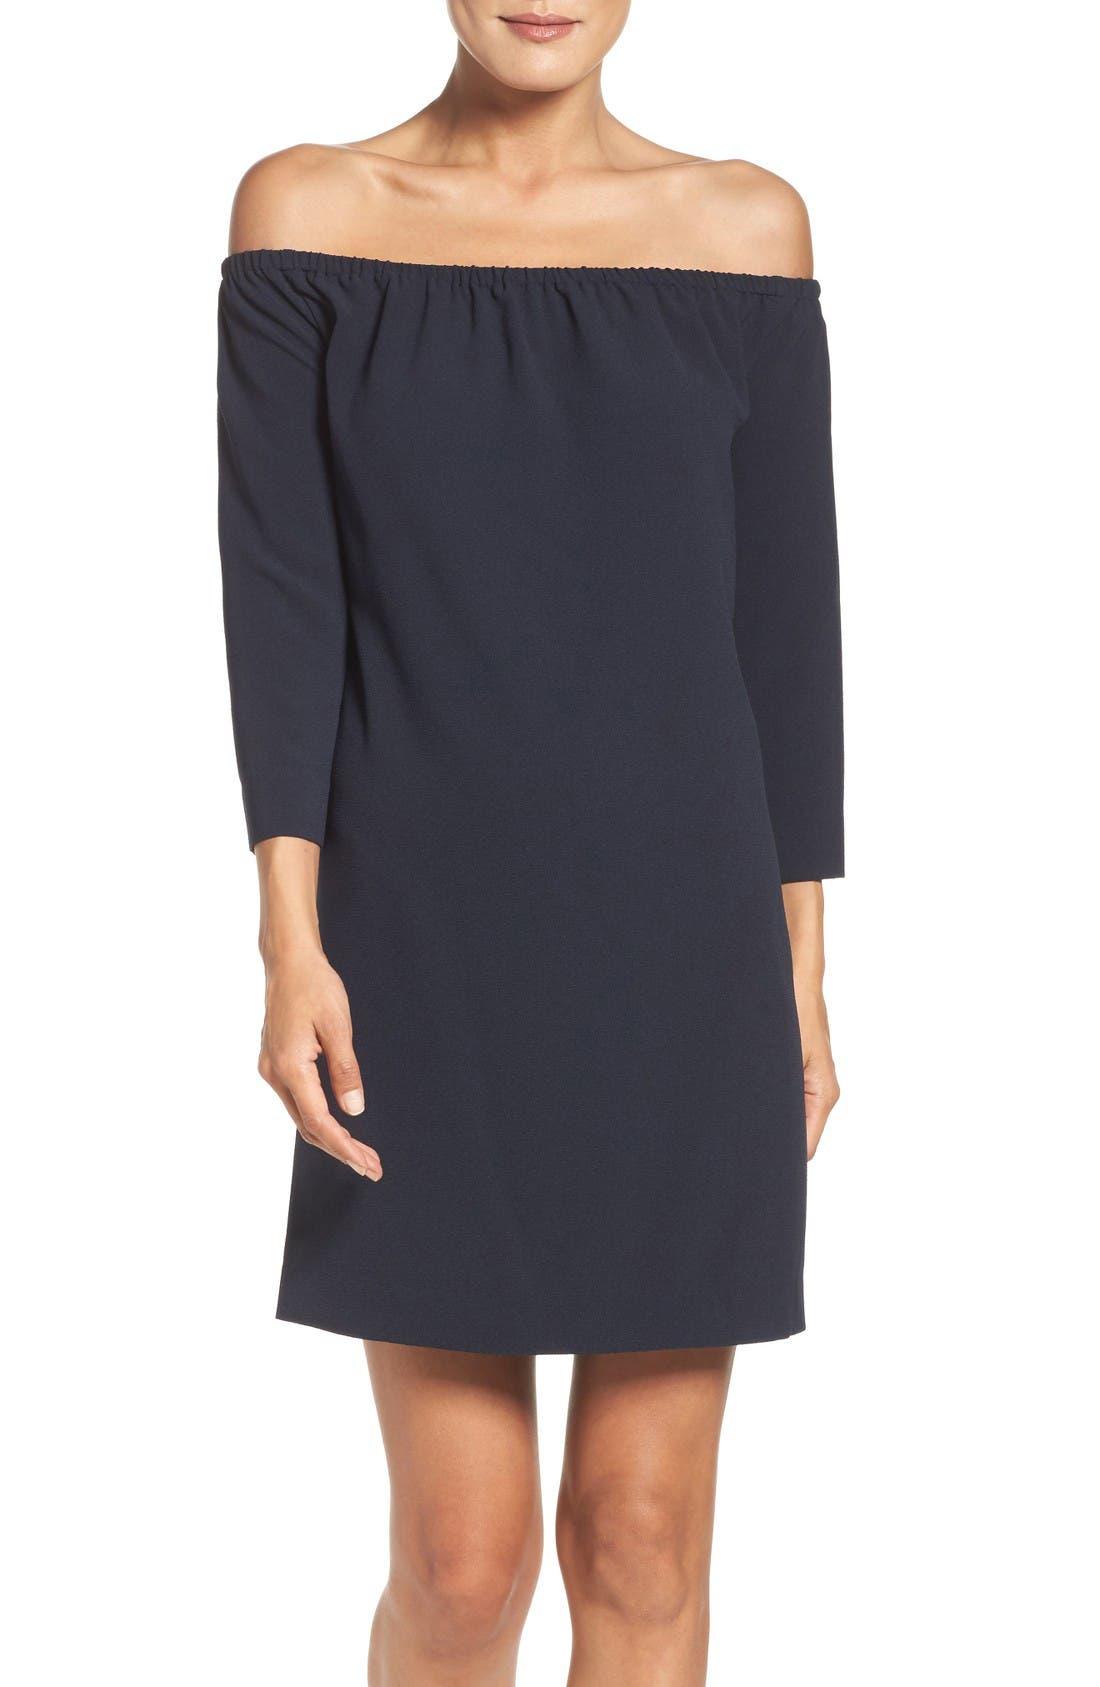 Felicity & Coco Lark Off the Shoulder Shift Dress (Nordstrom Exclusive)